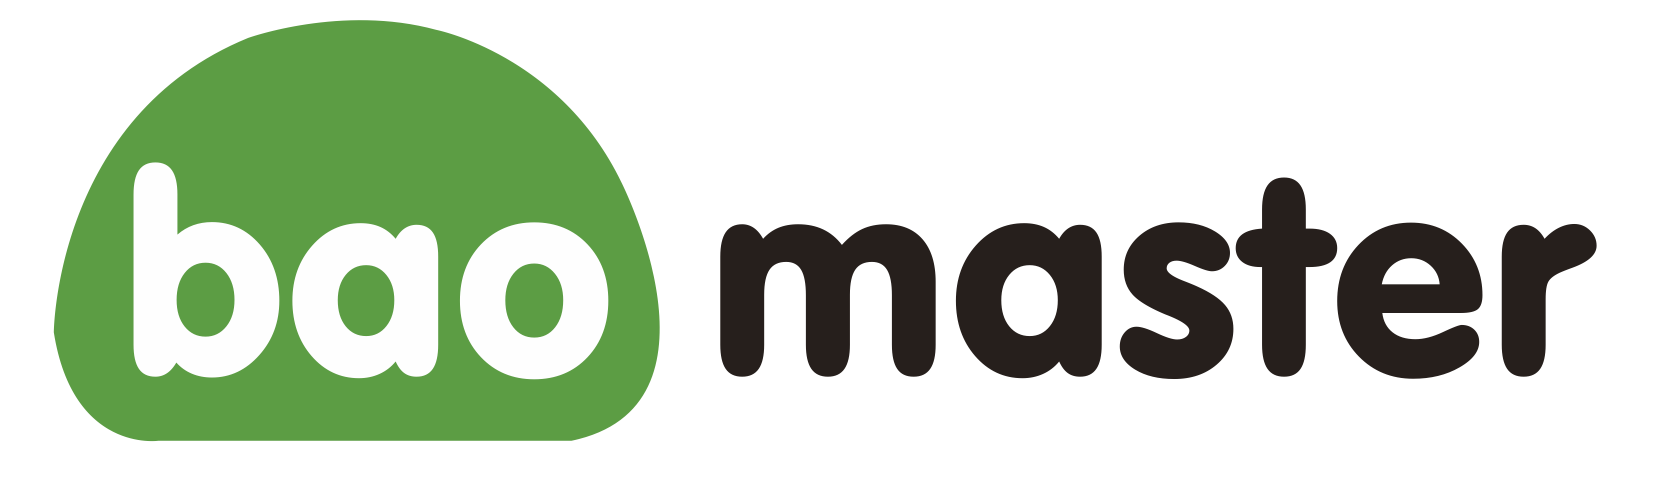 baomaster logo banner.png